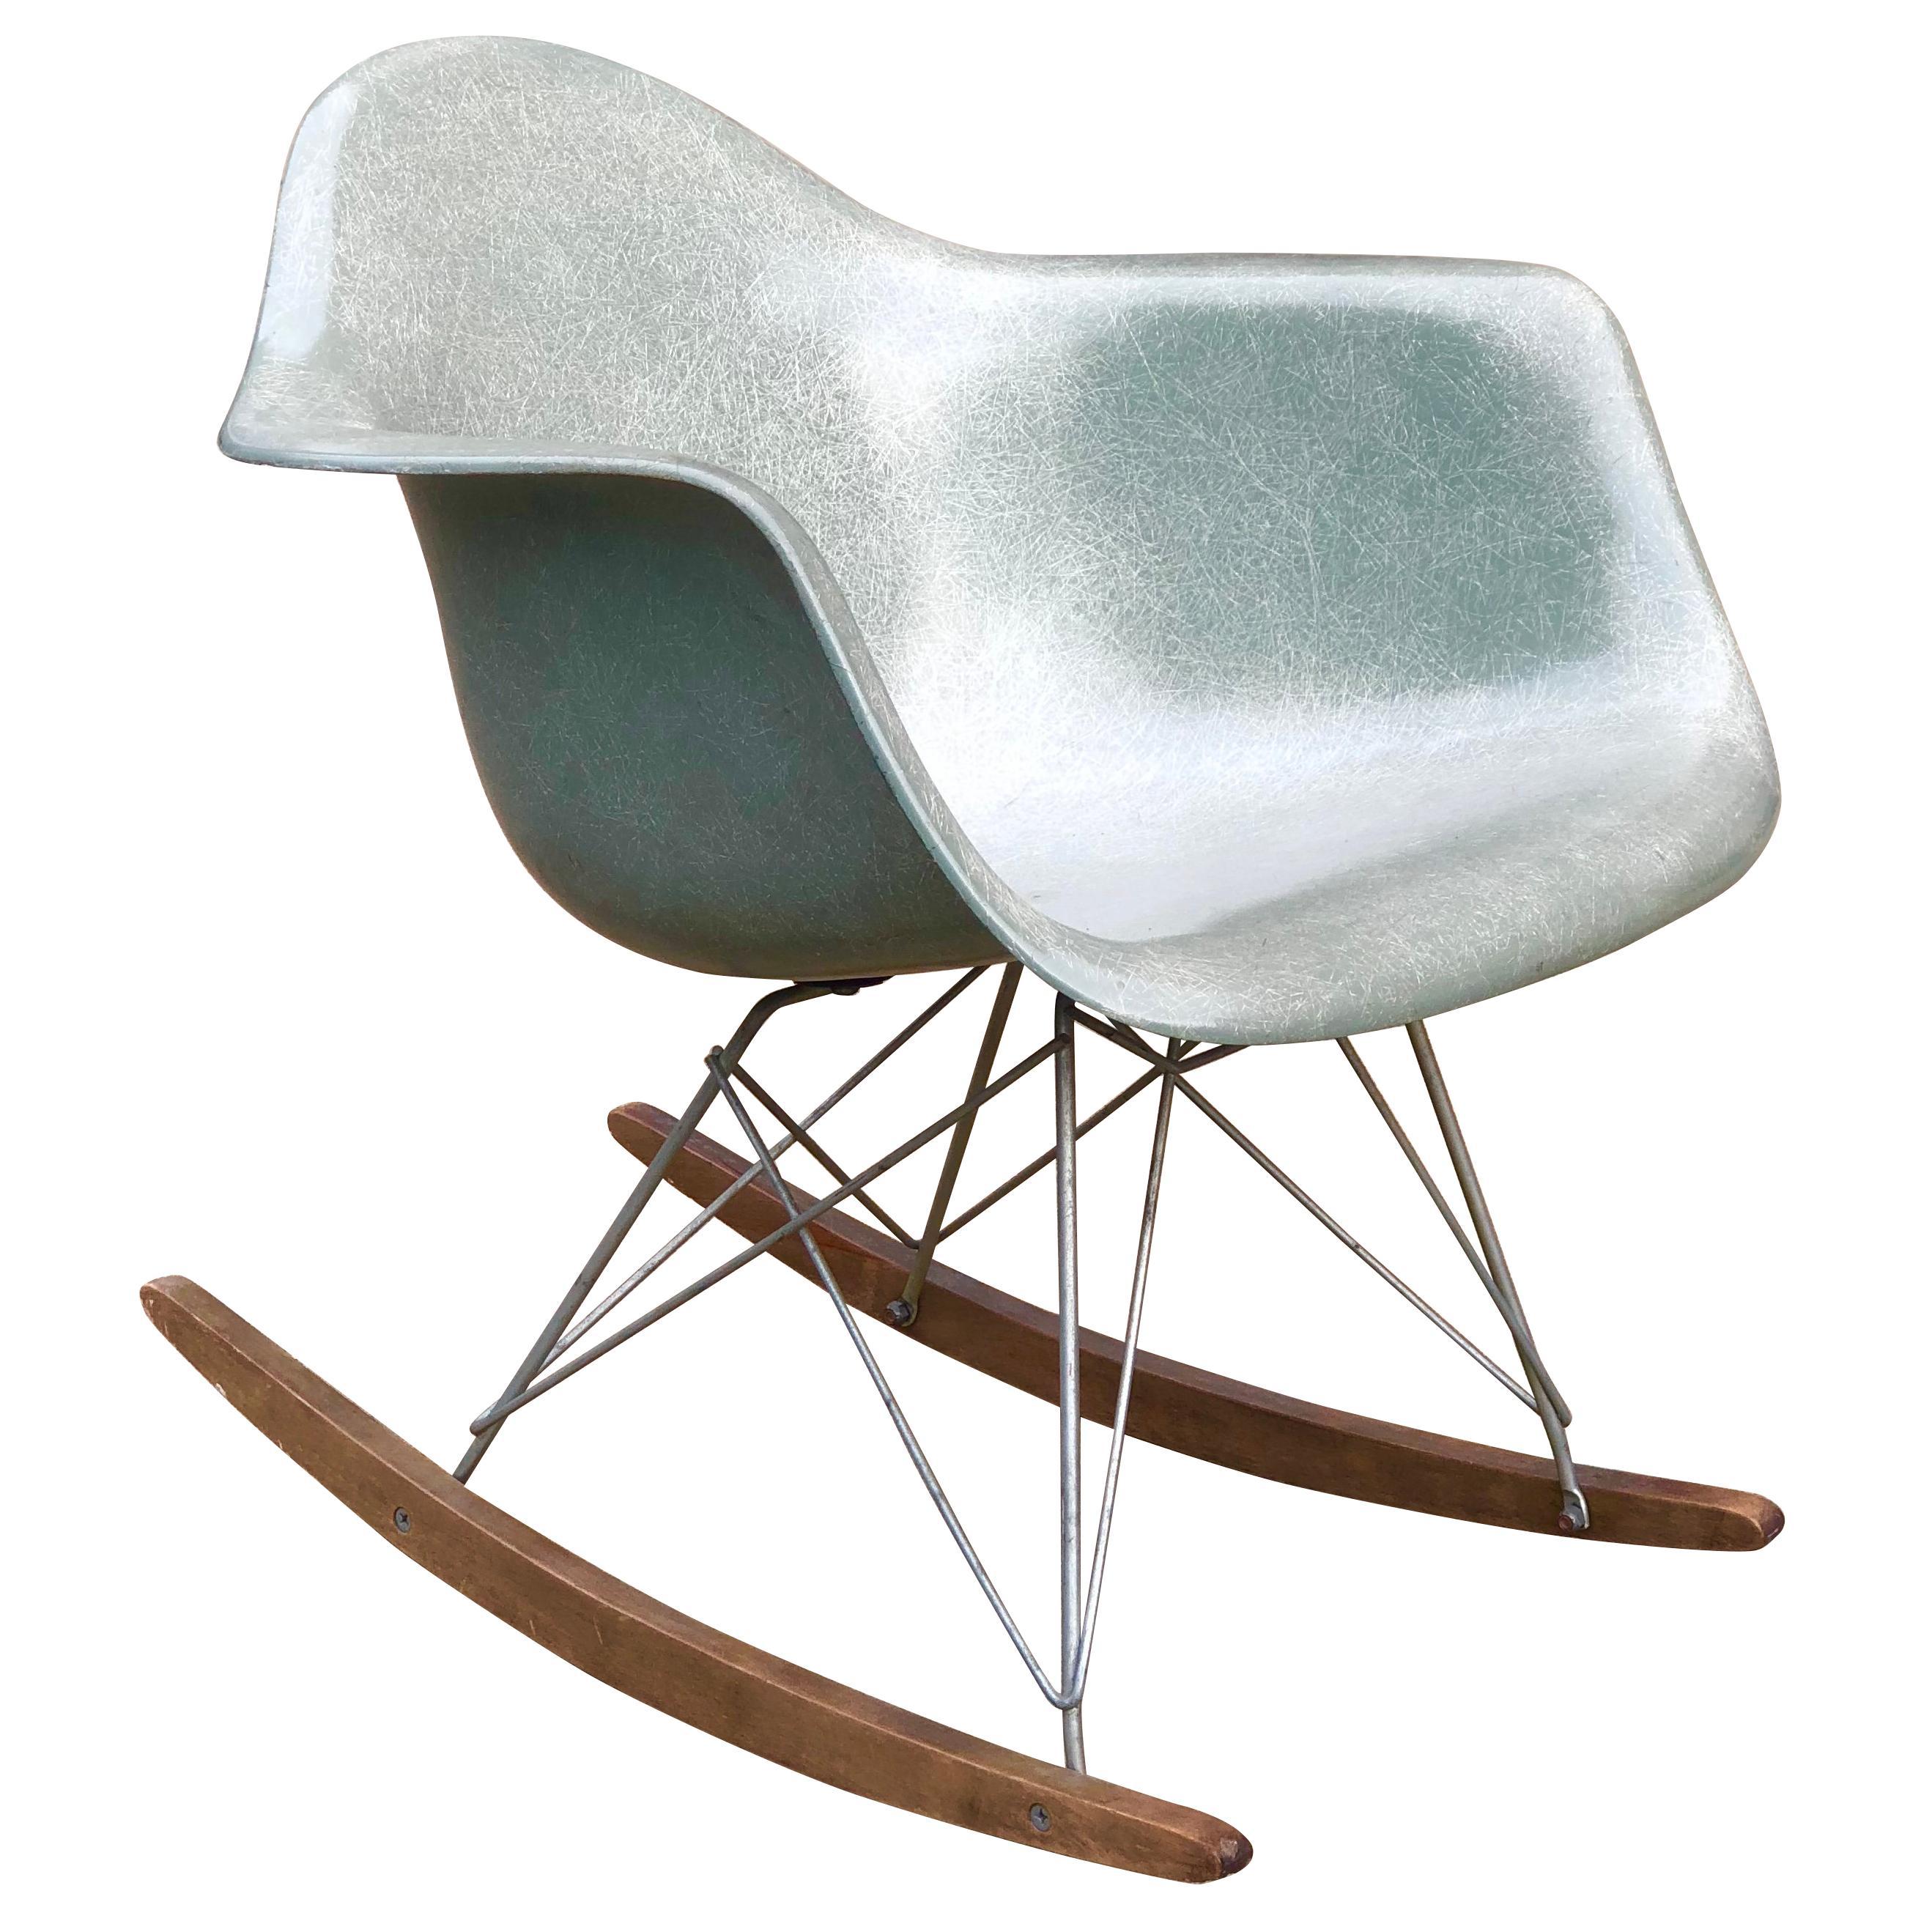 Herman Miller Eames RAR Rocking Chair in Seafoam Green